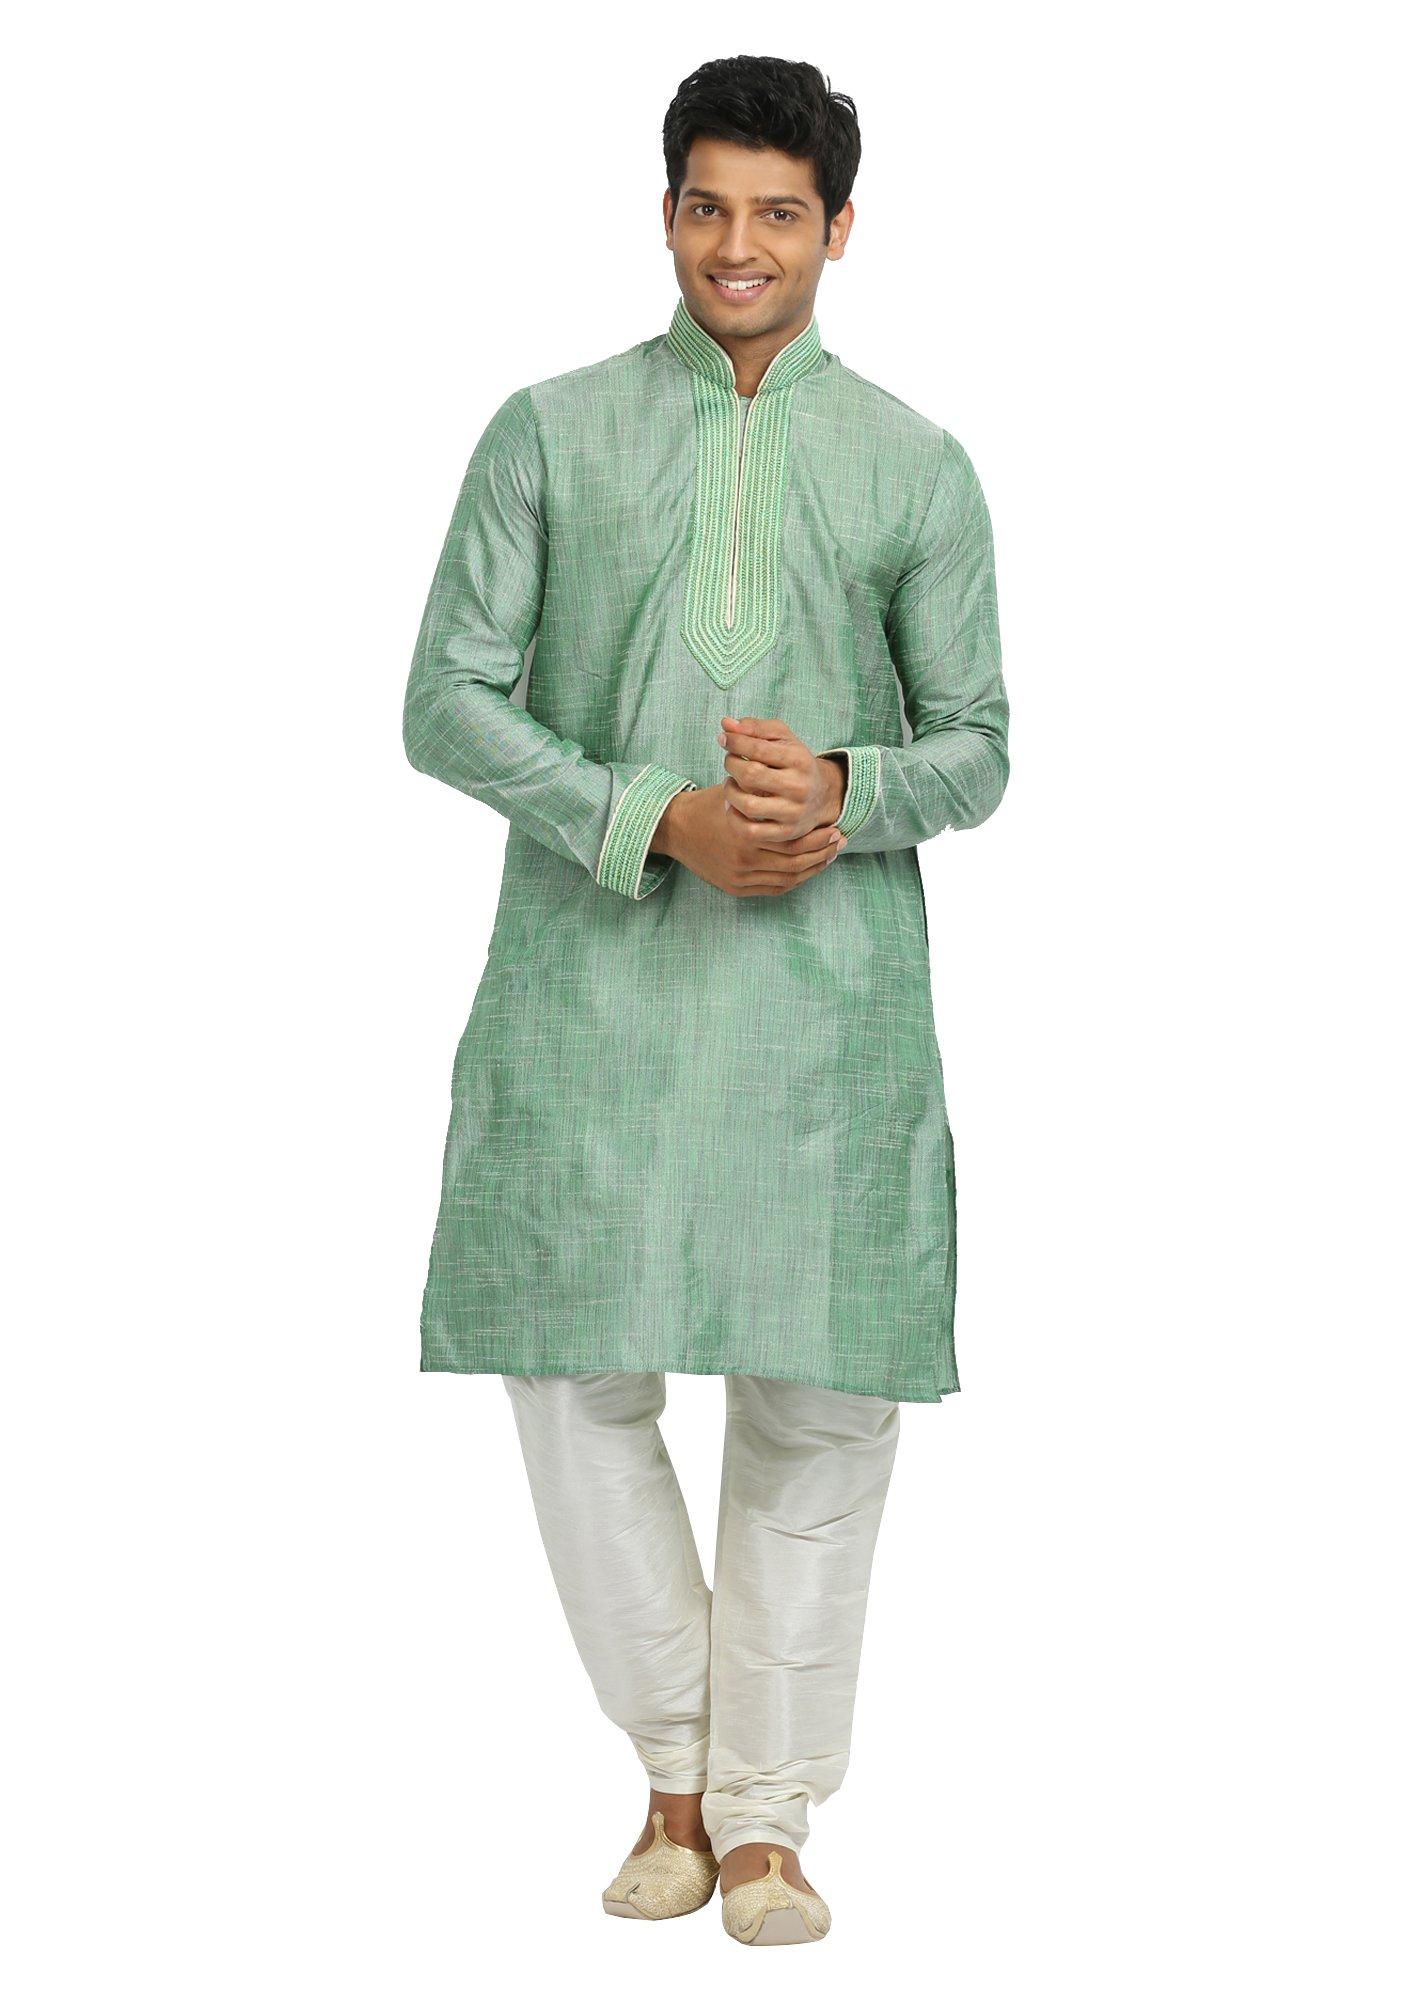 Saris and Things Aquamarine Cotton Linen Indian Wedding Kurta Pajama for Men